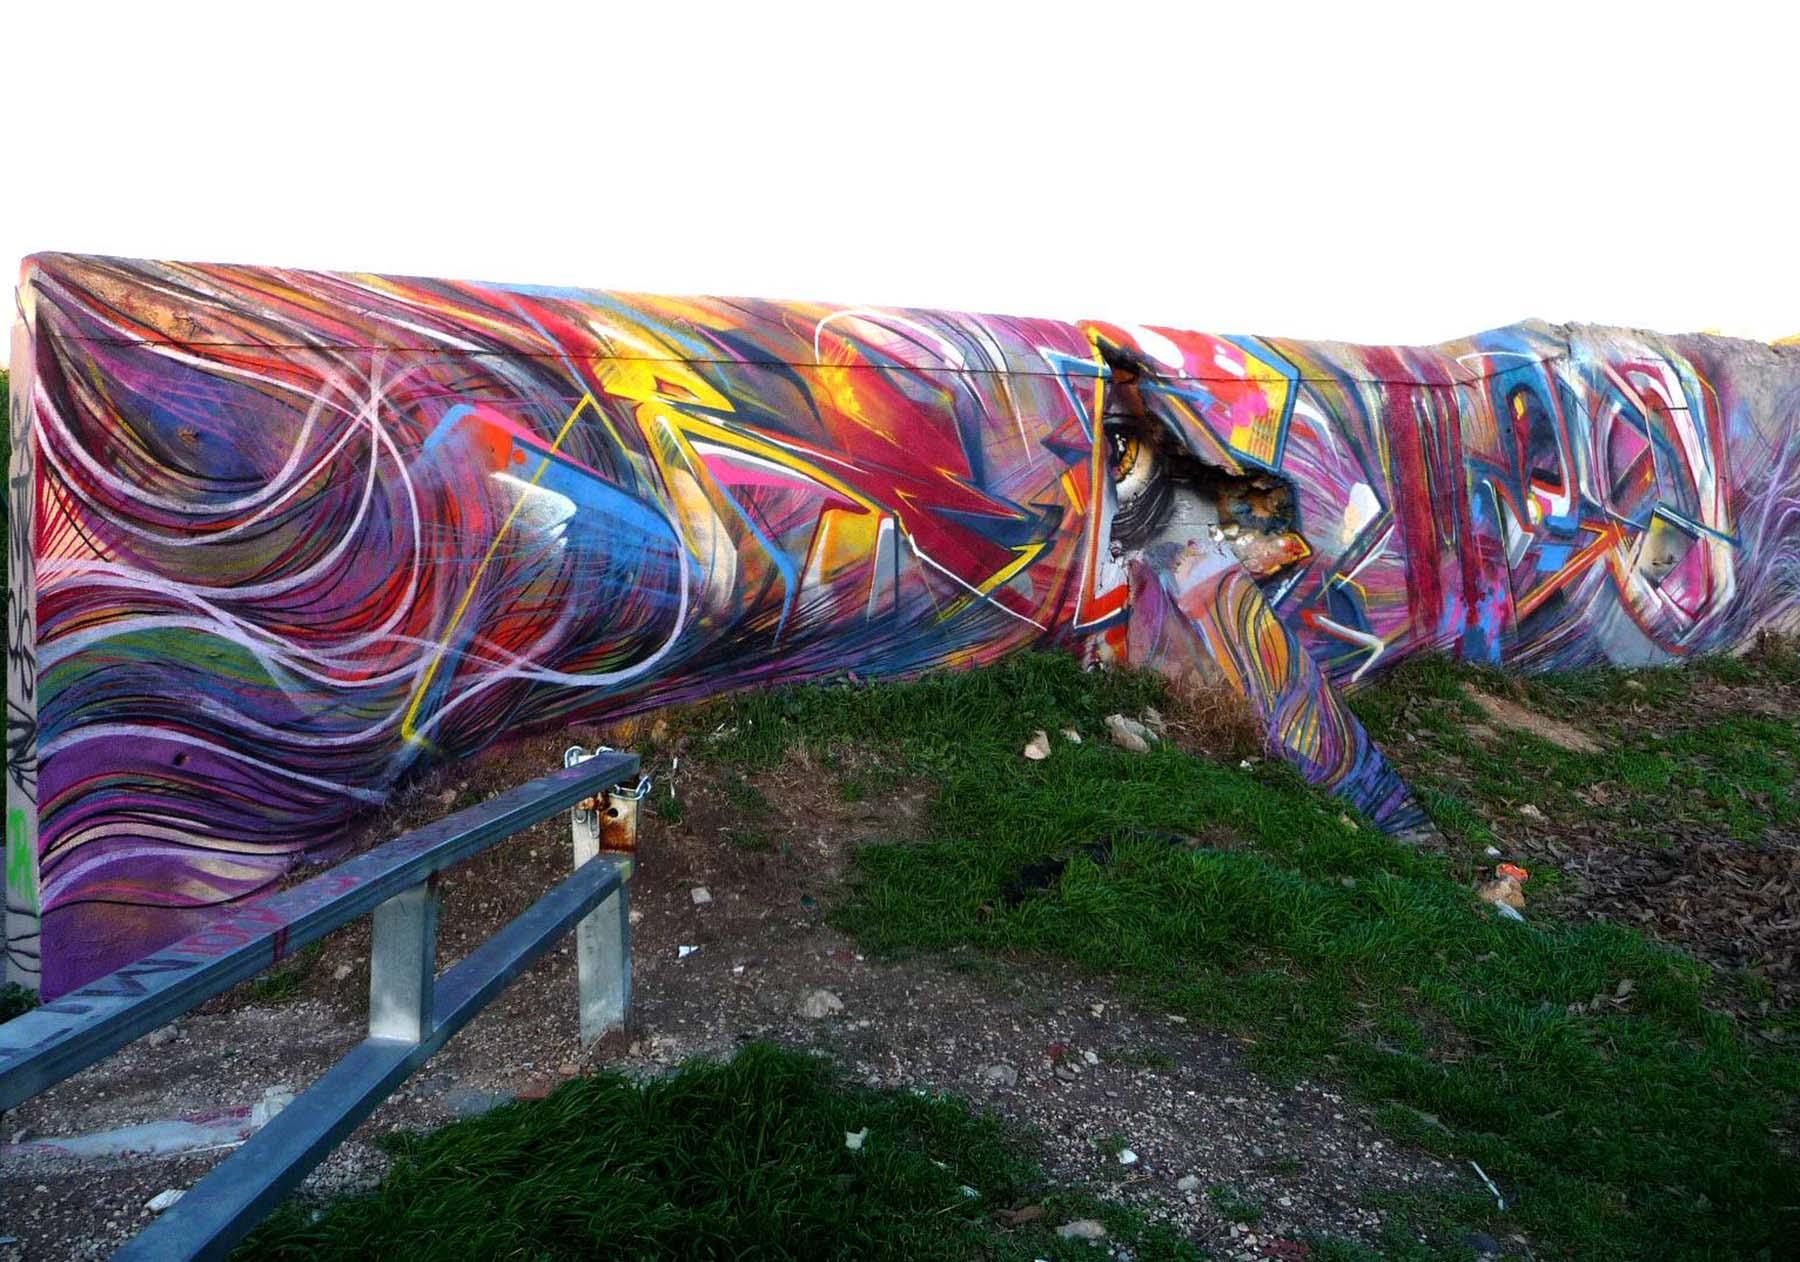 https://www.propaganza.be/wp-content/uploads/2019/04/Real-propaganza-urban-artist-graffiti-graff-street-art-spray-painting-belgique-4.jpg